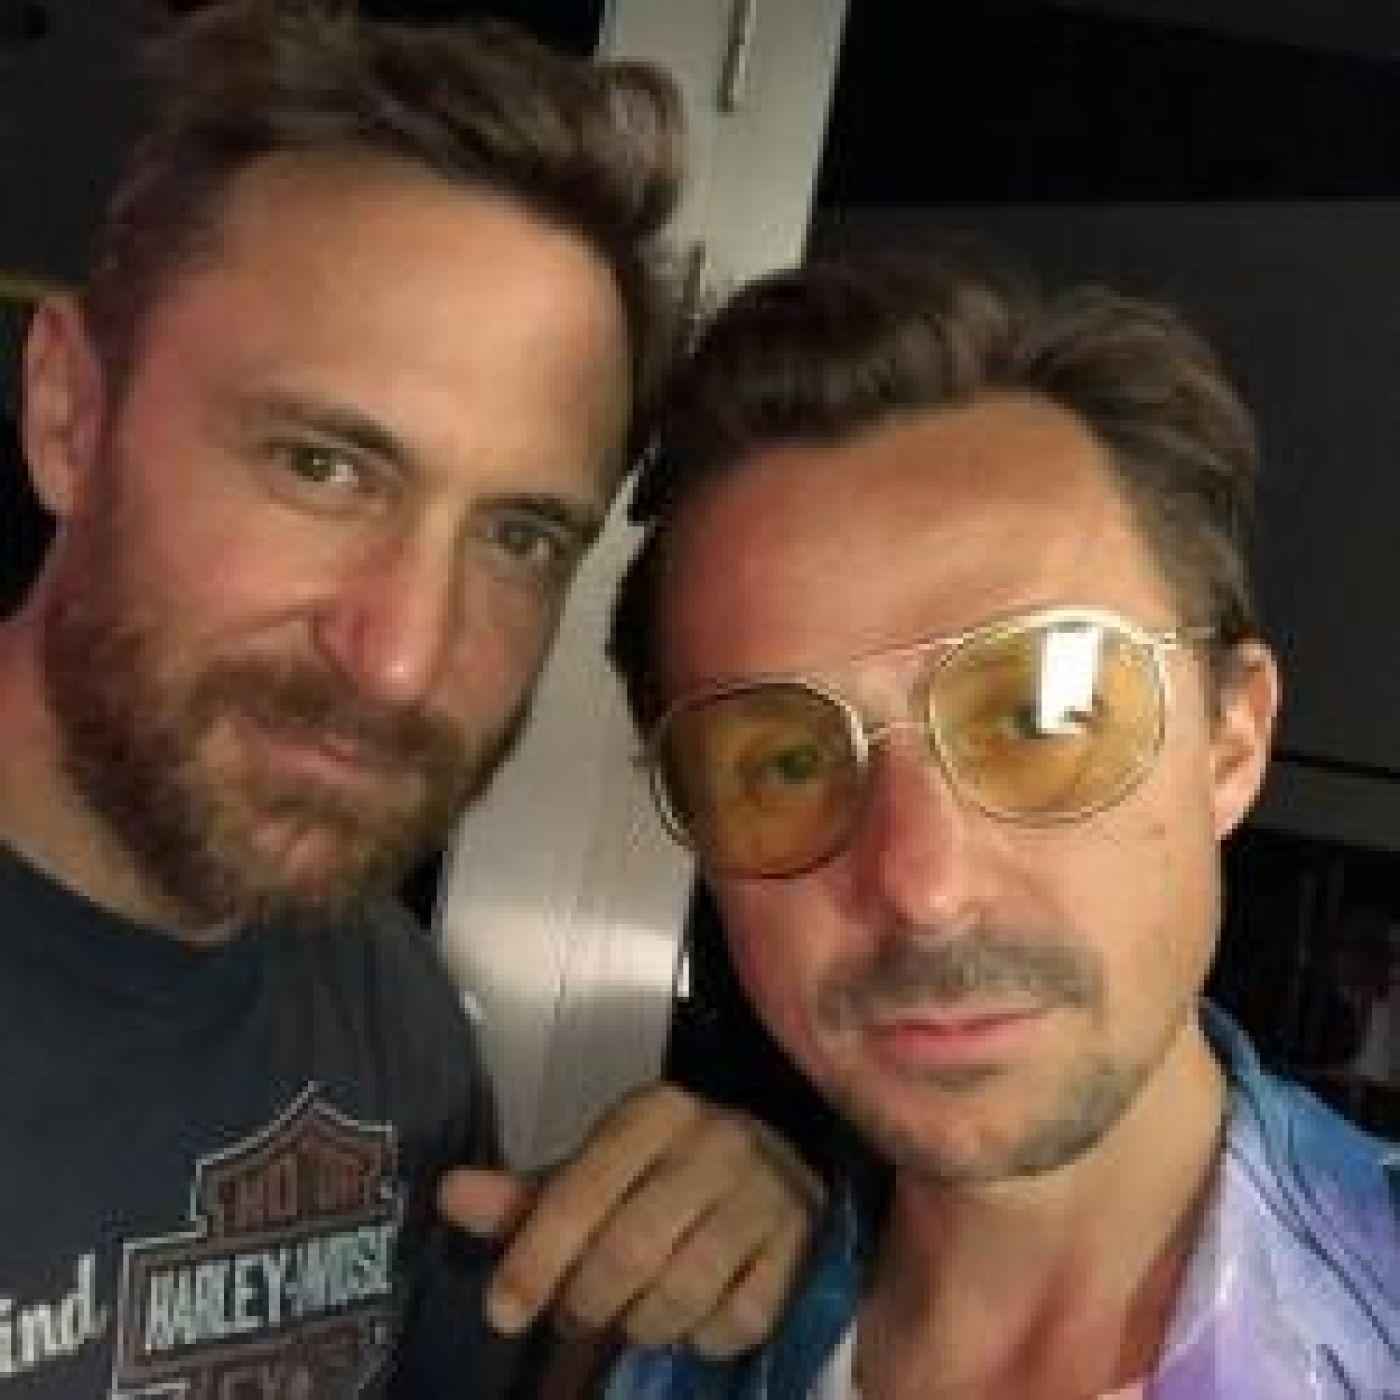 La music story de la Matinale FG : David Guetta & Martin Solveig